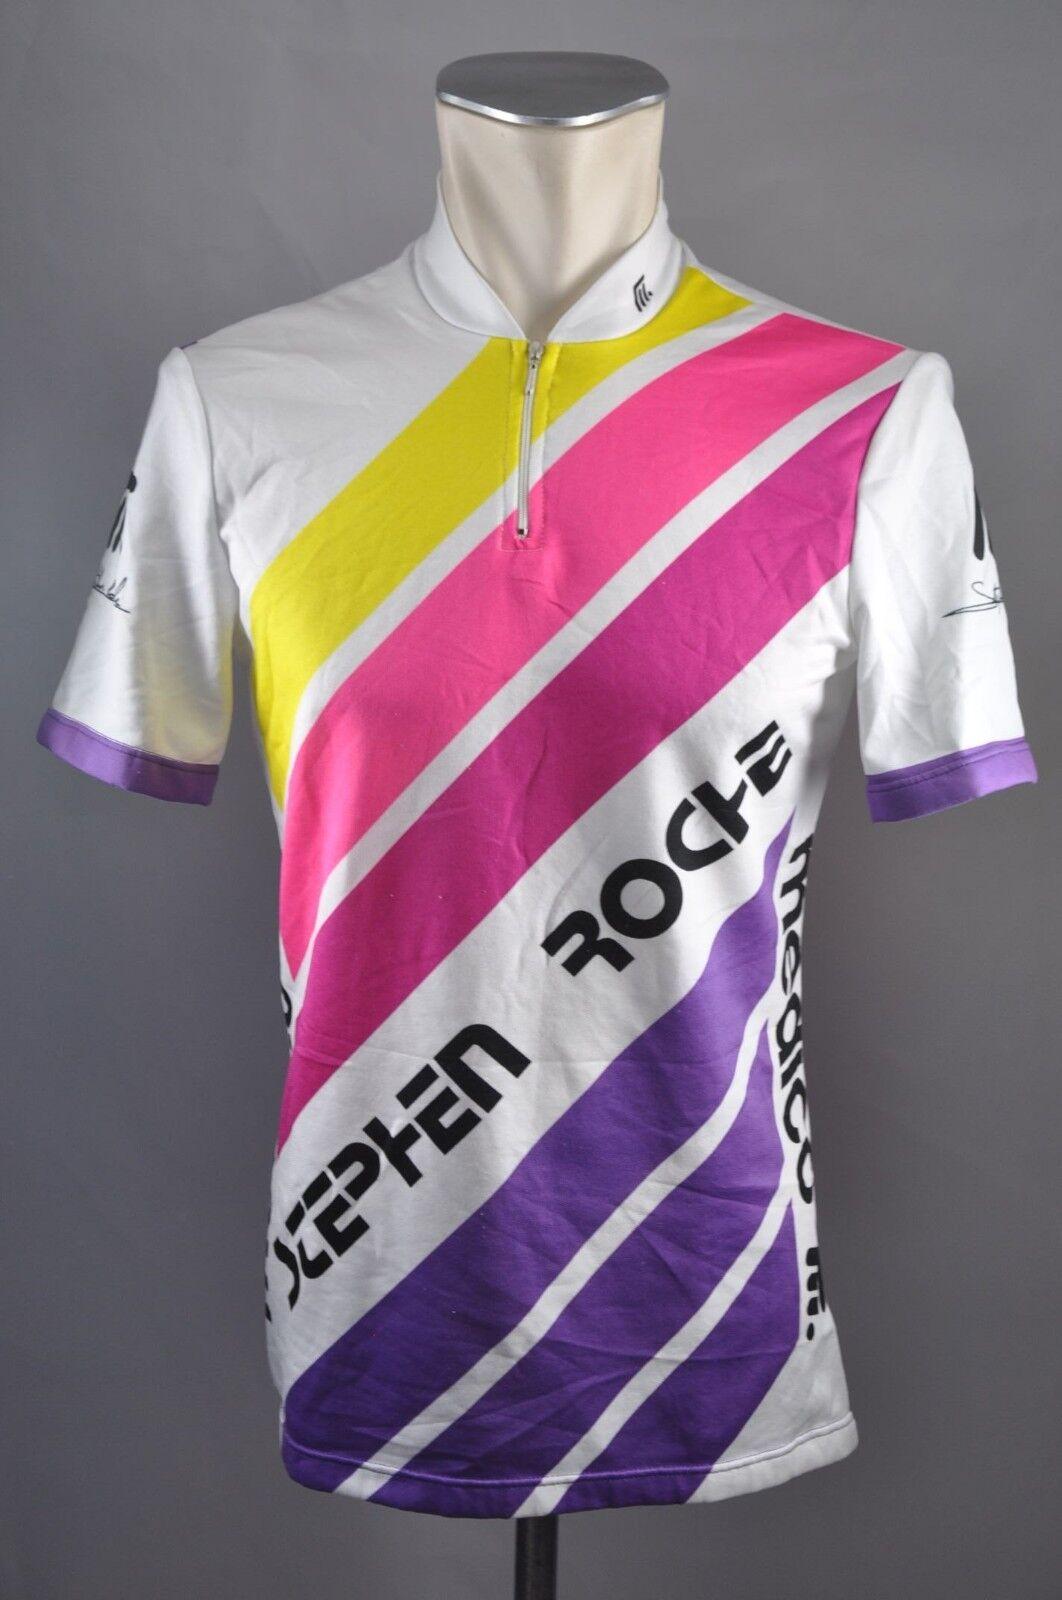 Medico Stephen Roche vintage jersey cycling jersey Bike Rad Trikot Gr. M 50cm J